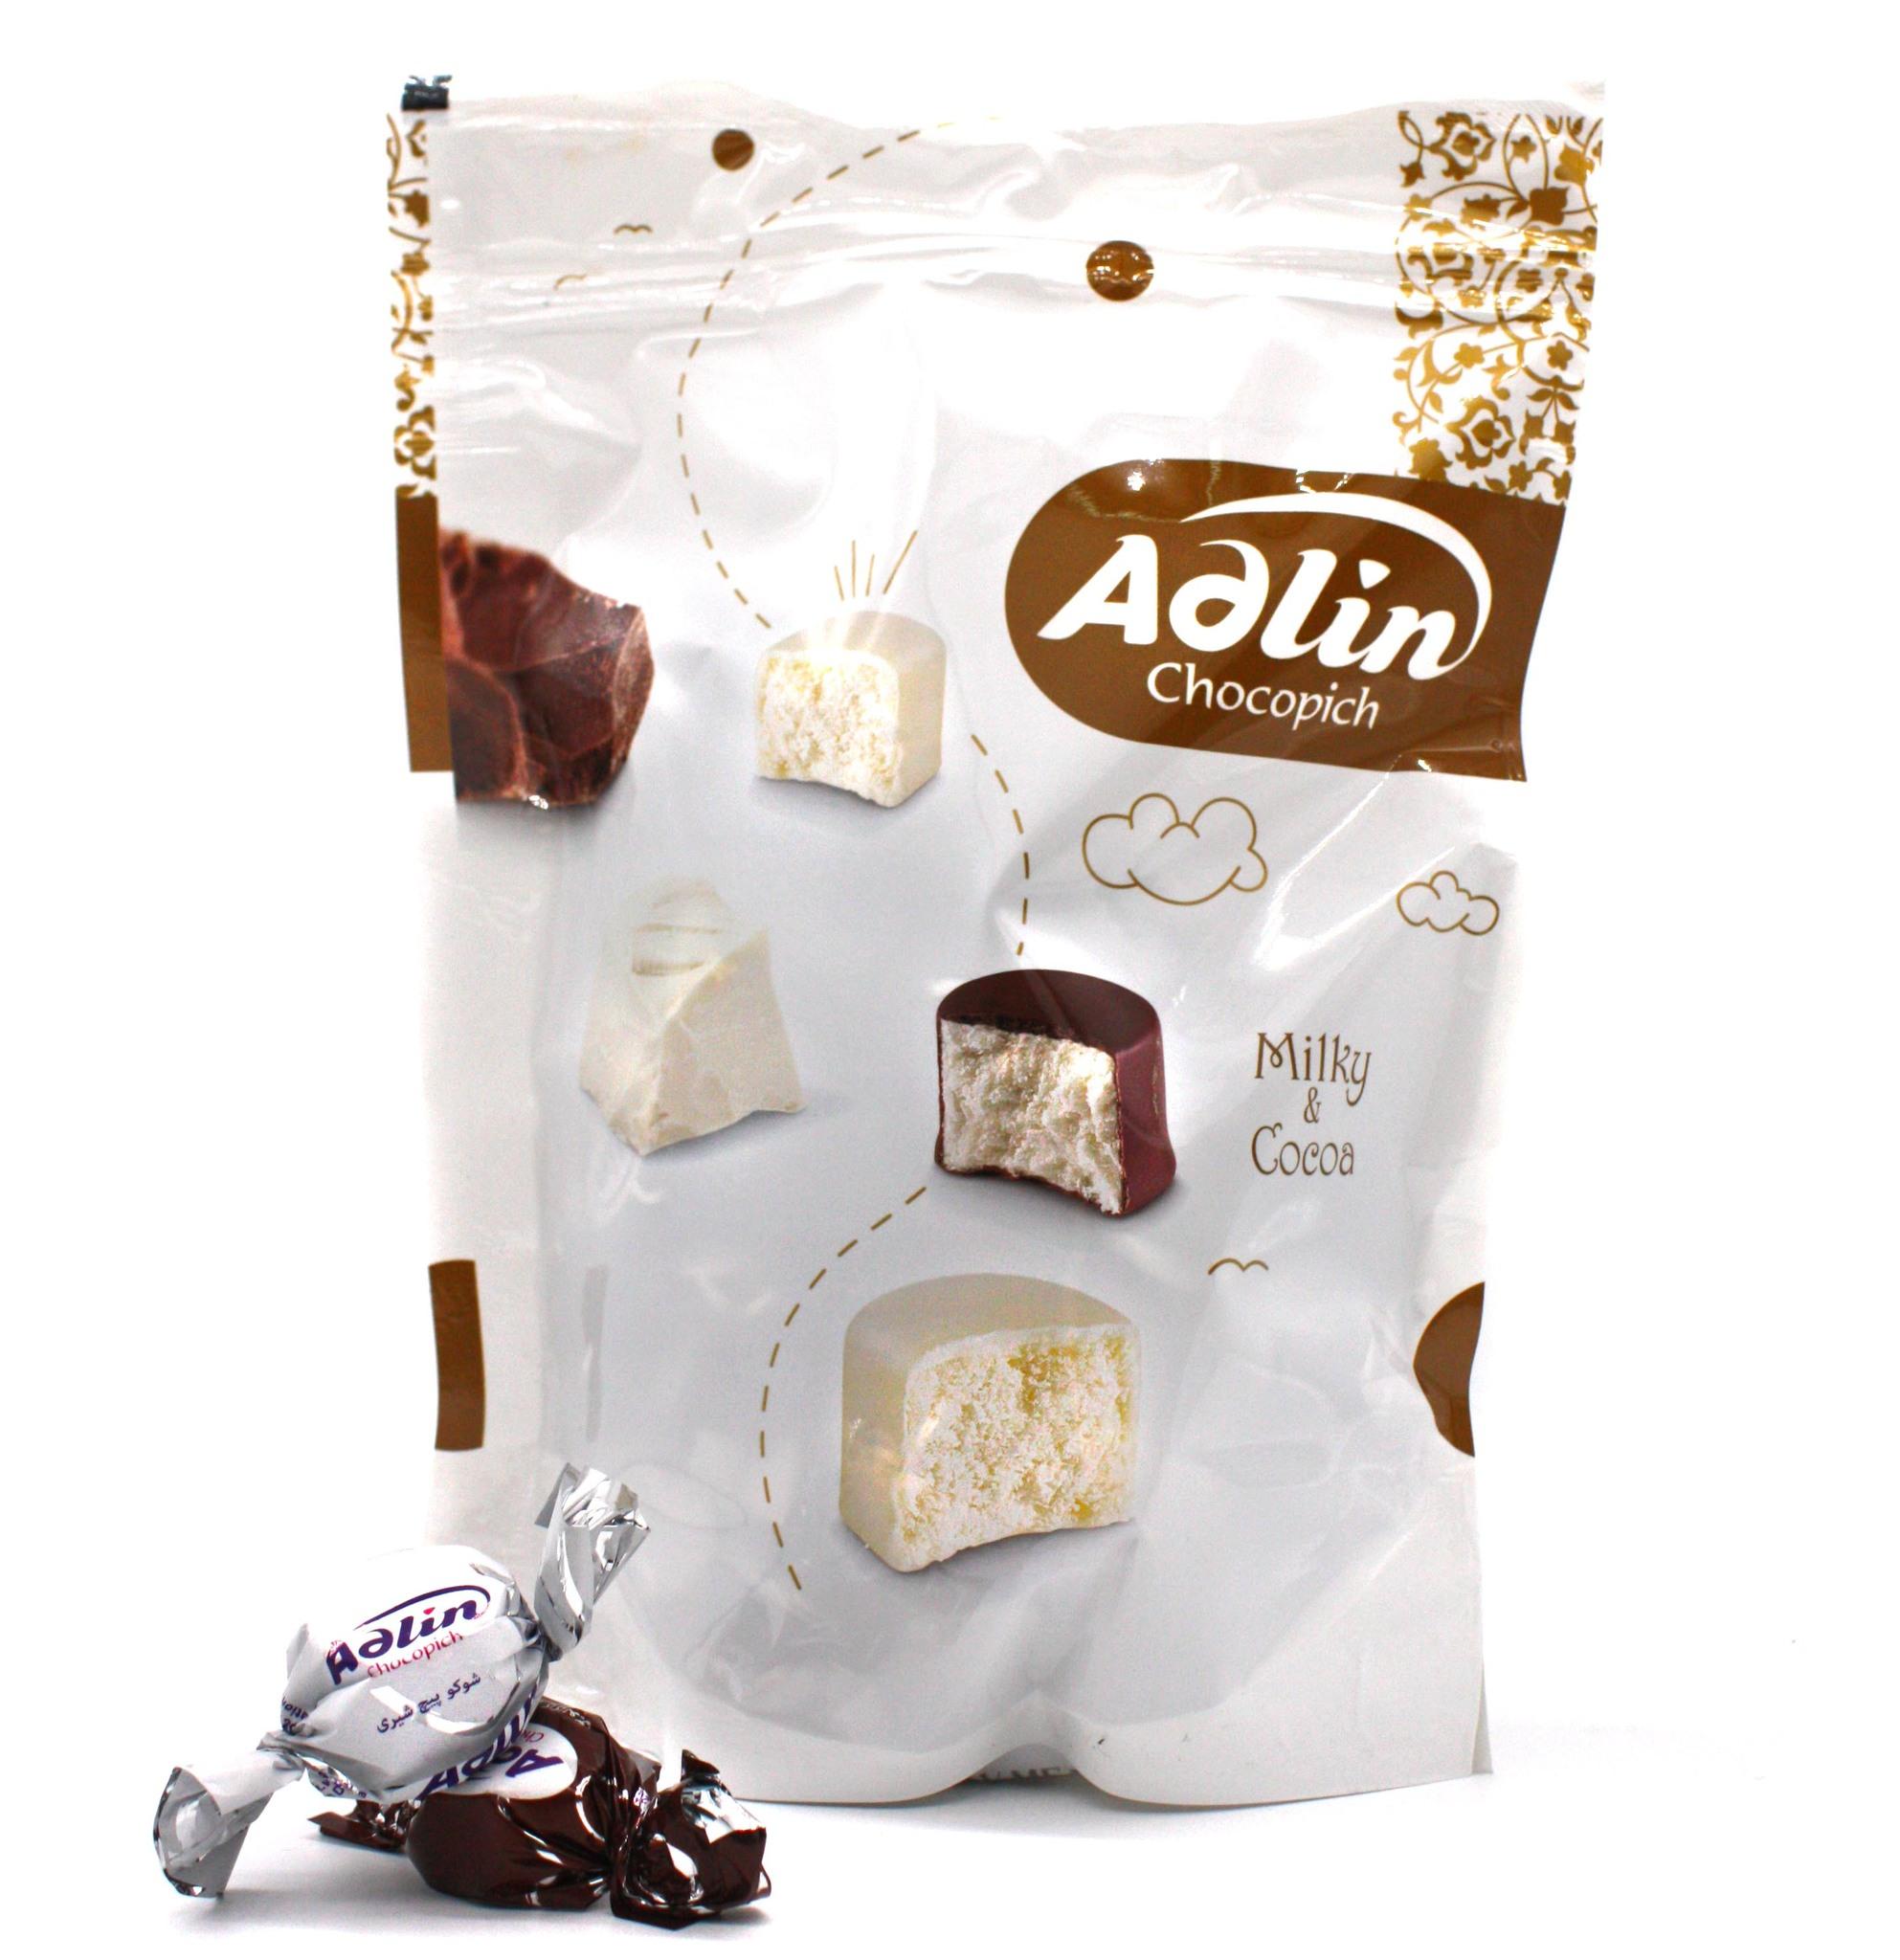 Пишмание Пишмание с молочным и ванильным вкусом в глазури, Adlin, 350 г import_files_a2_a2b1acbbf24f11e8a9a1484d7ecee297_0dfb2031f79511e8a9a1484d7ecee297.jpg